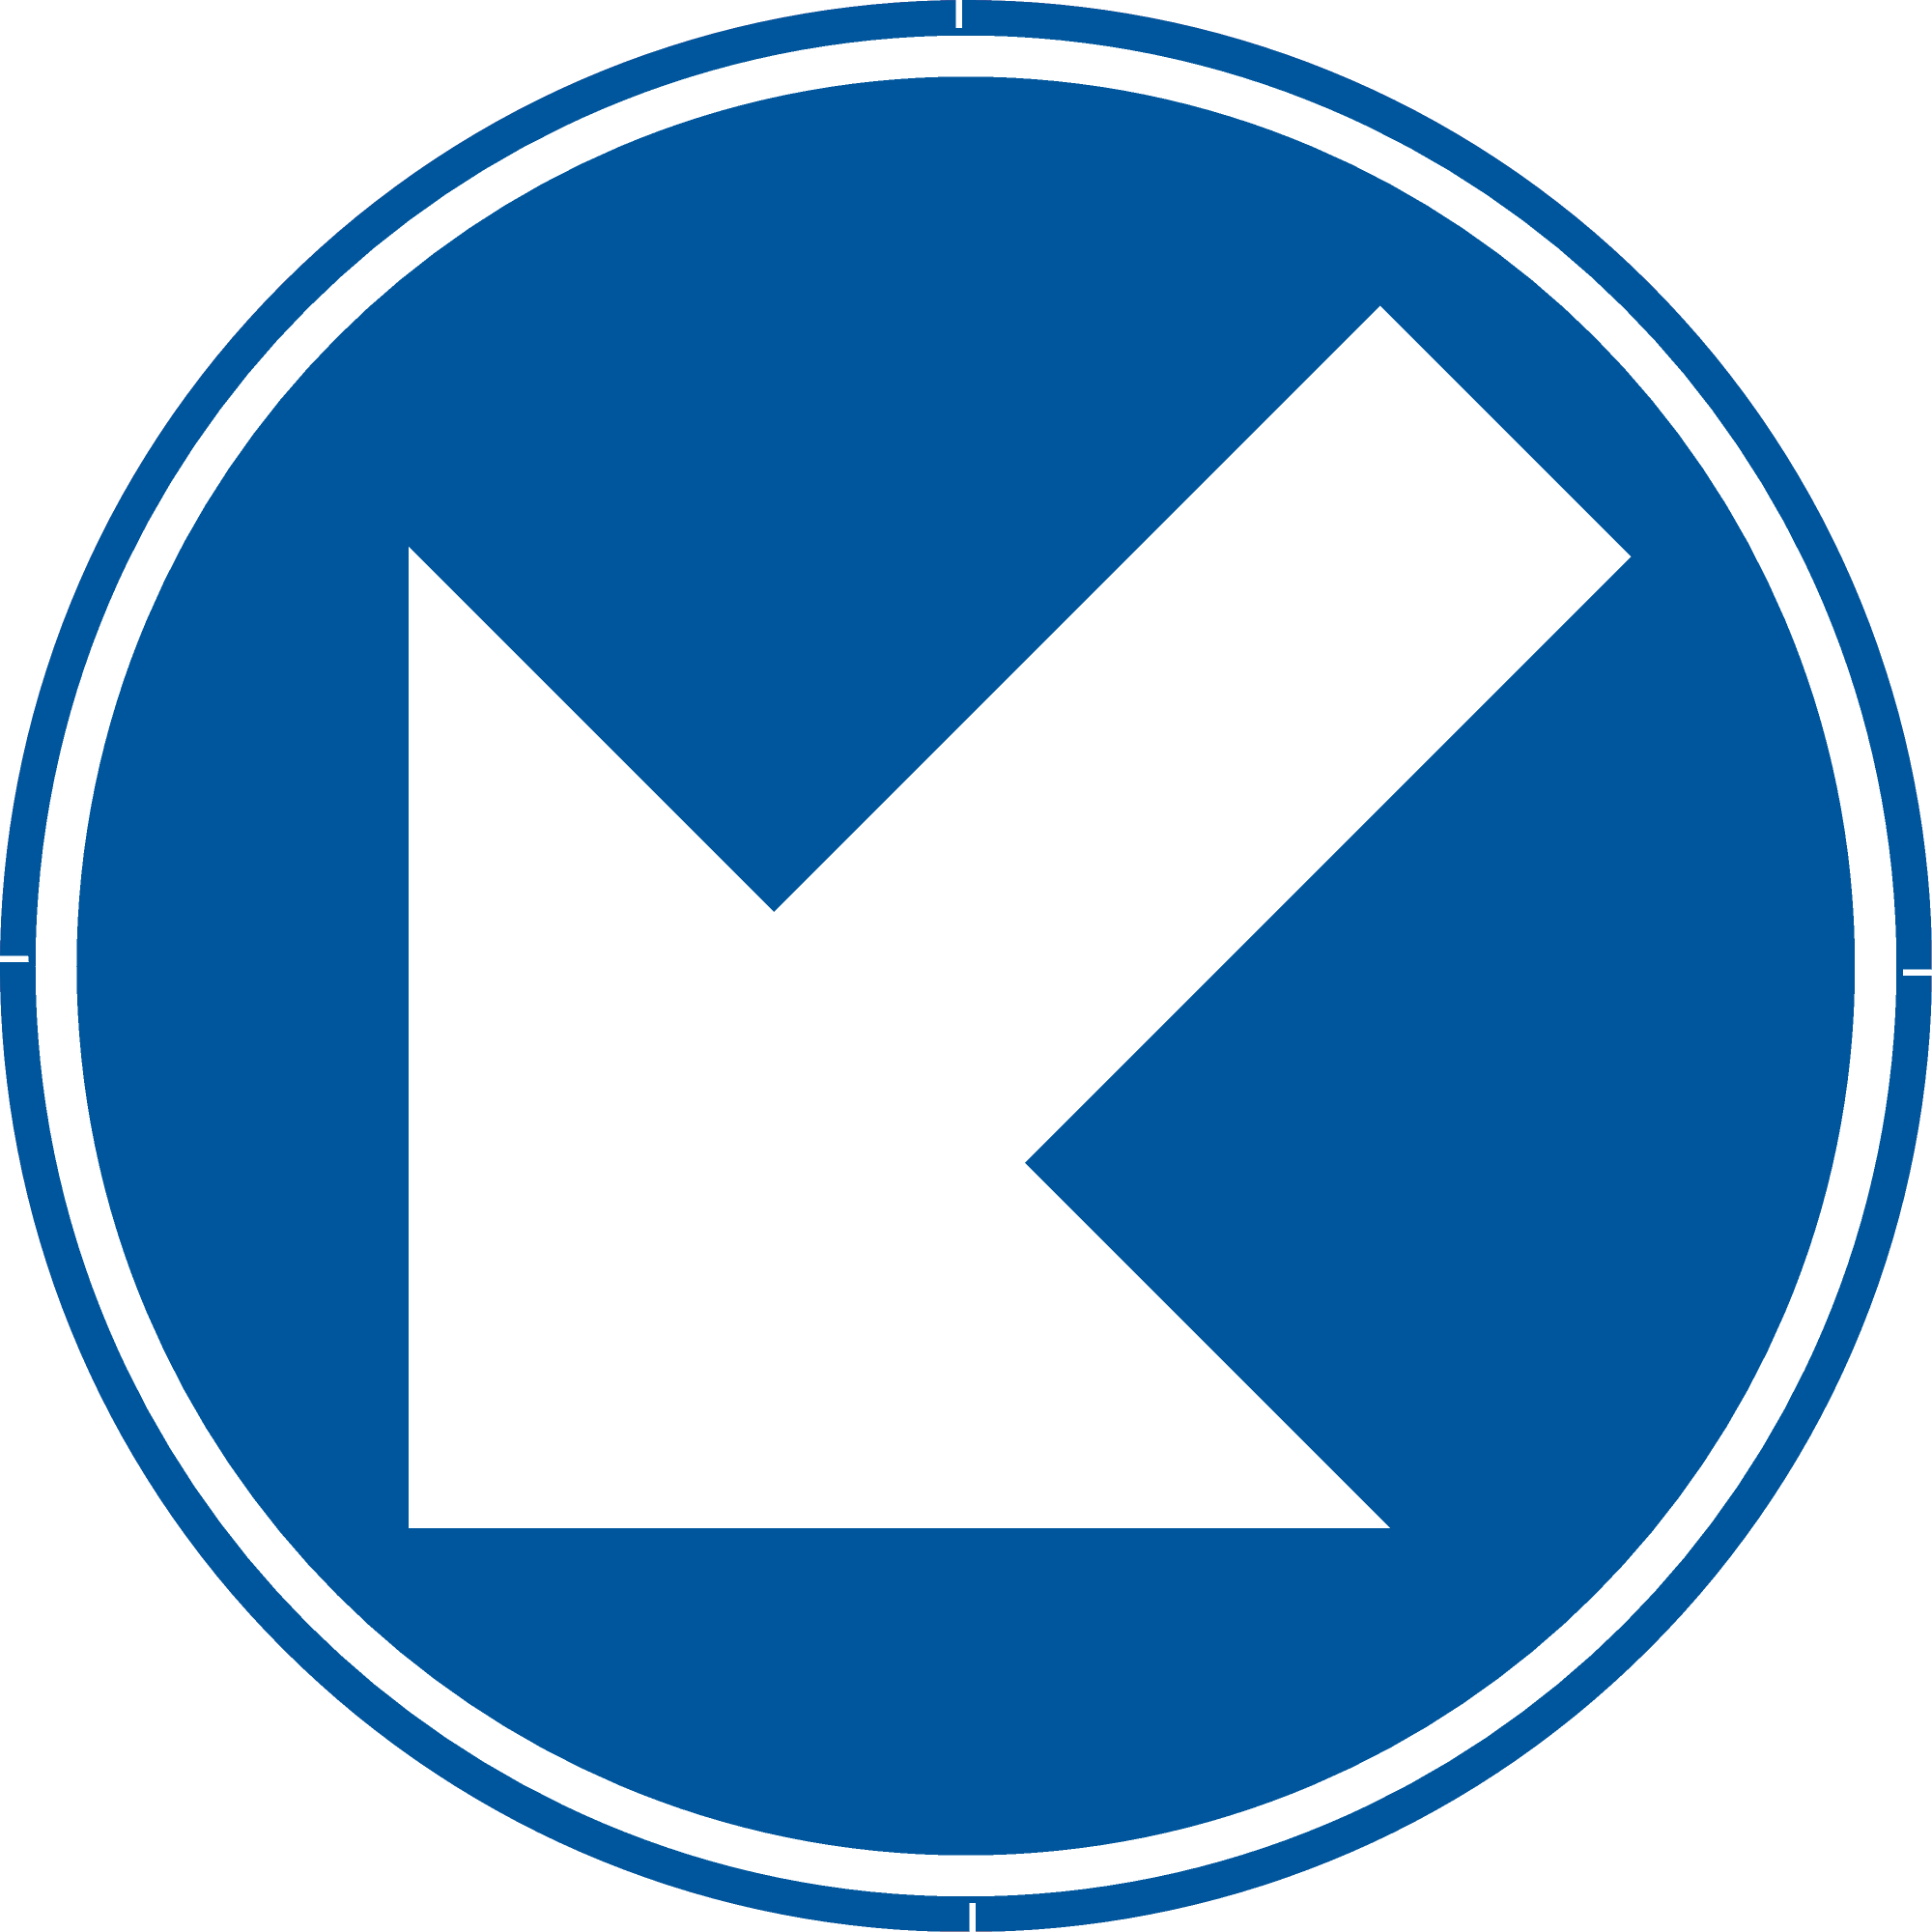 Signface - D1c - klasse  I - Ø 400 mm